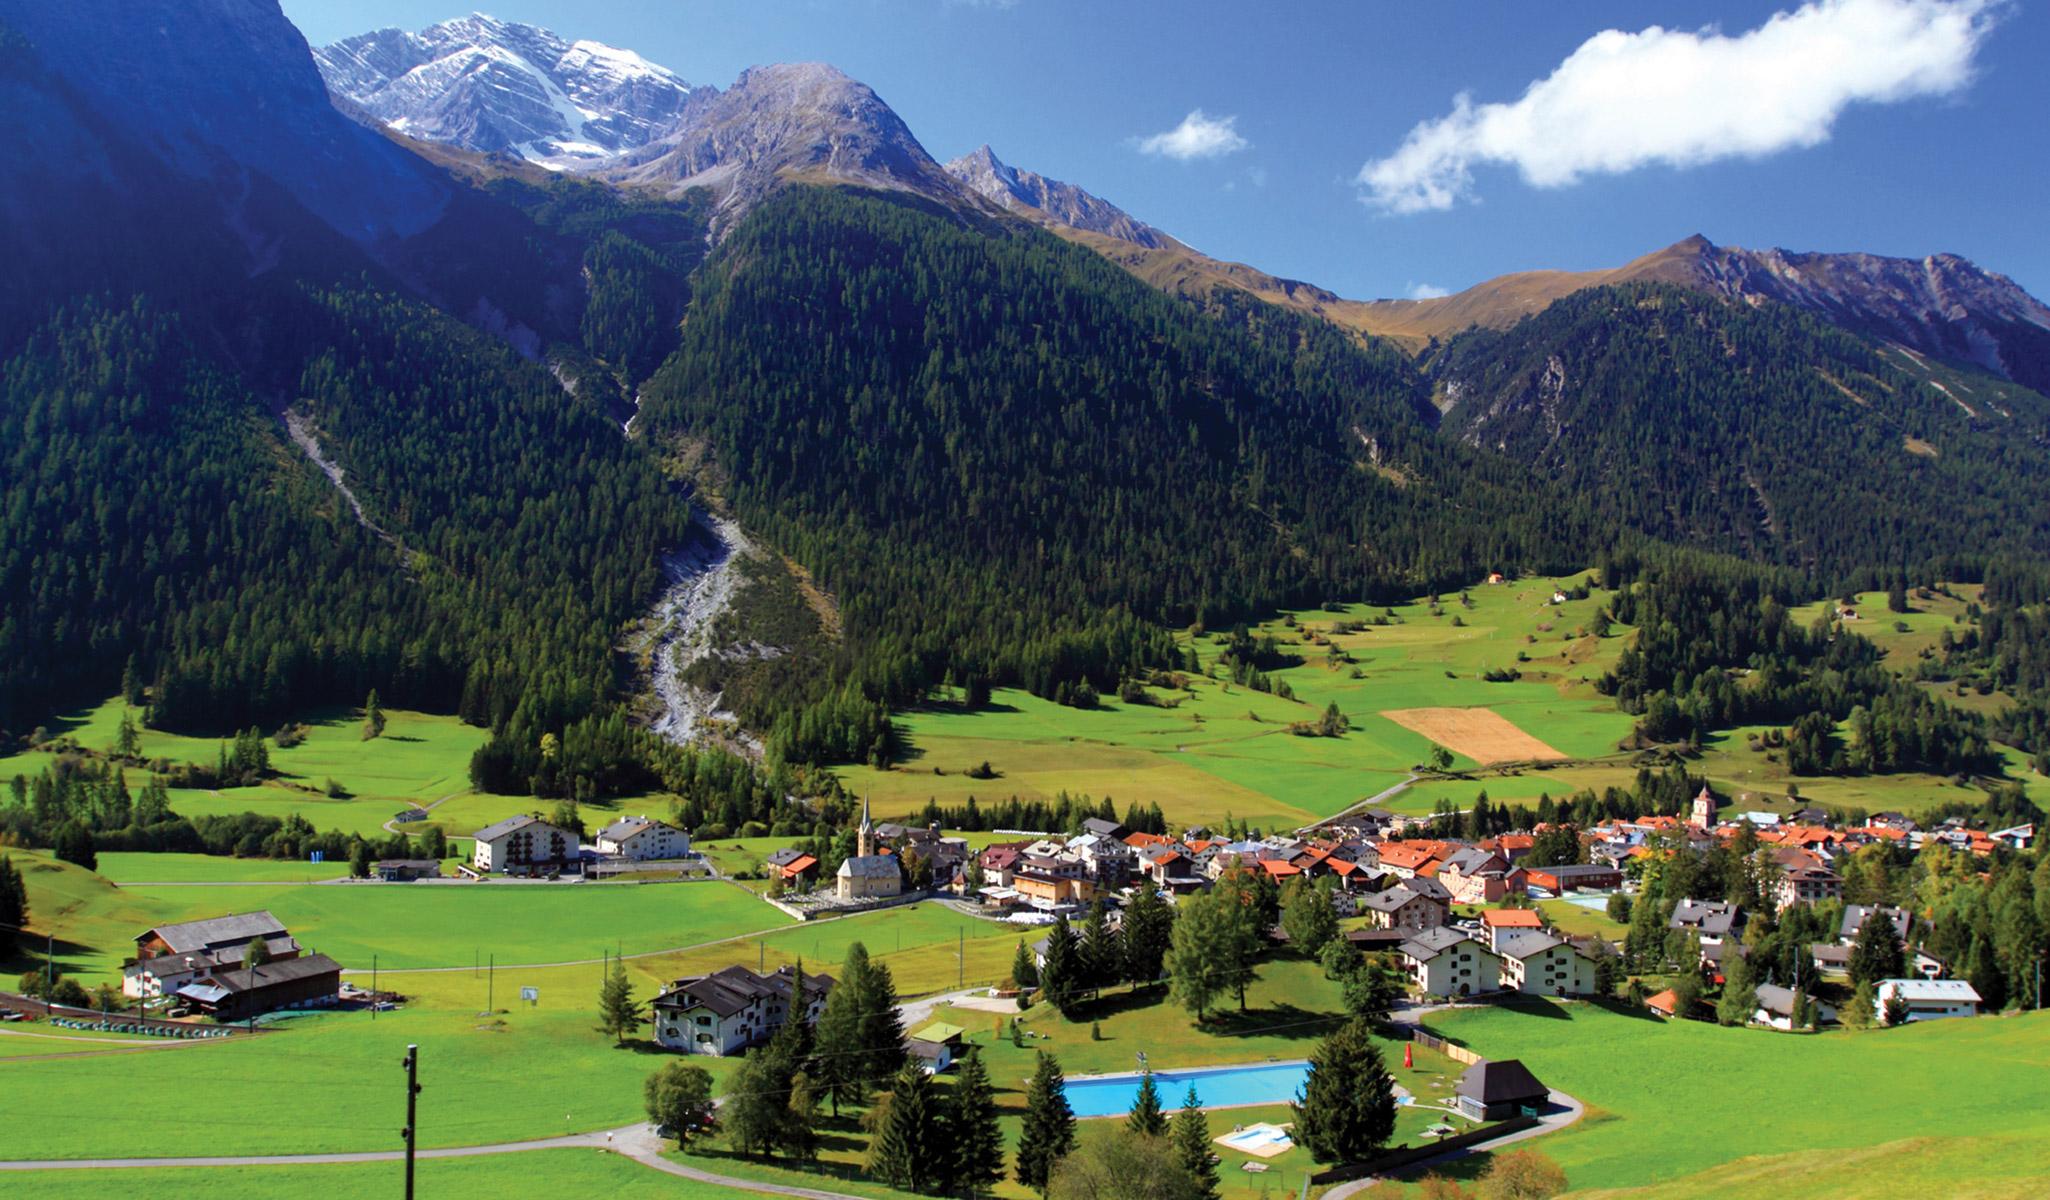 Vols Vers La Suisse Air Transat